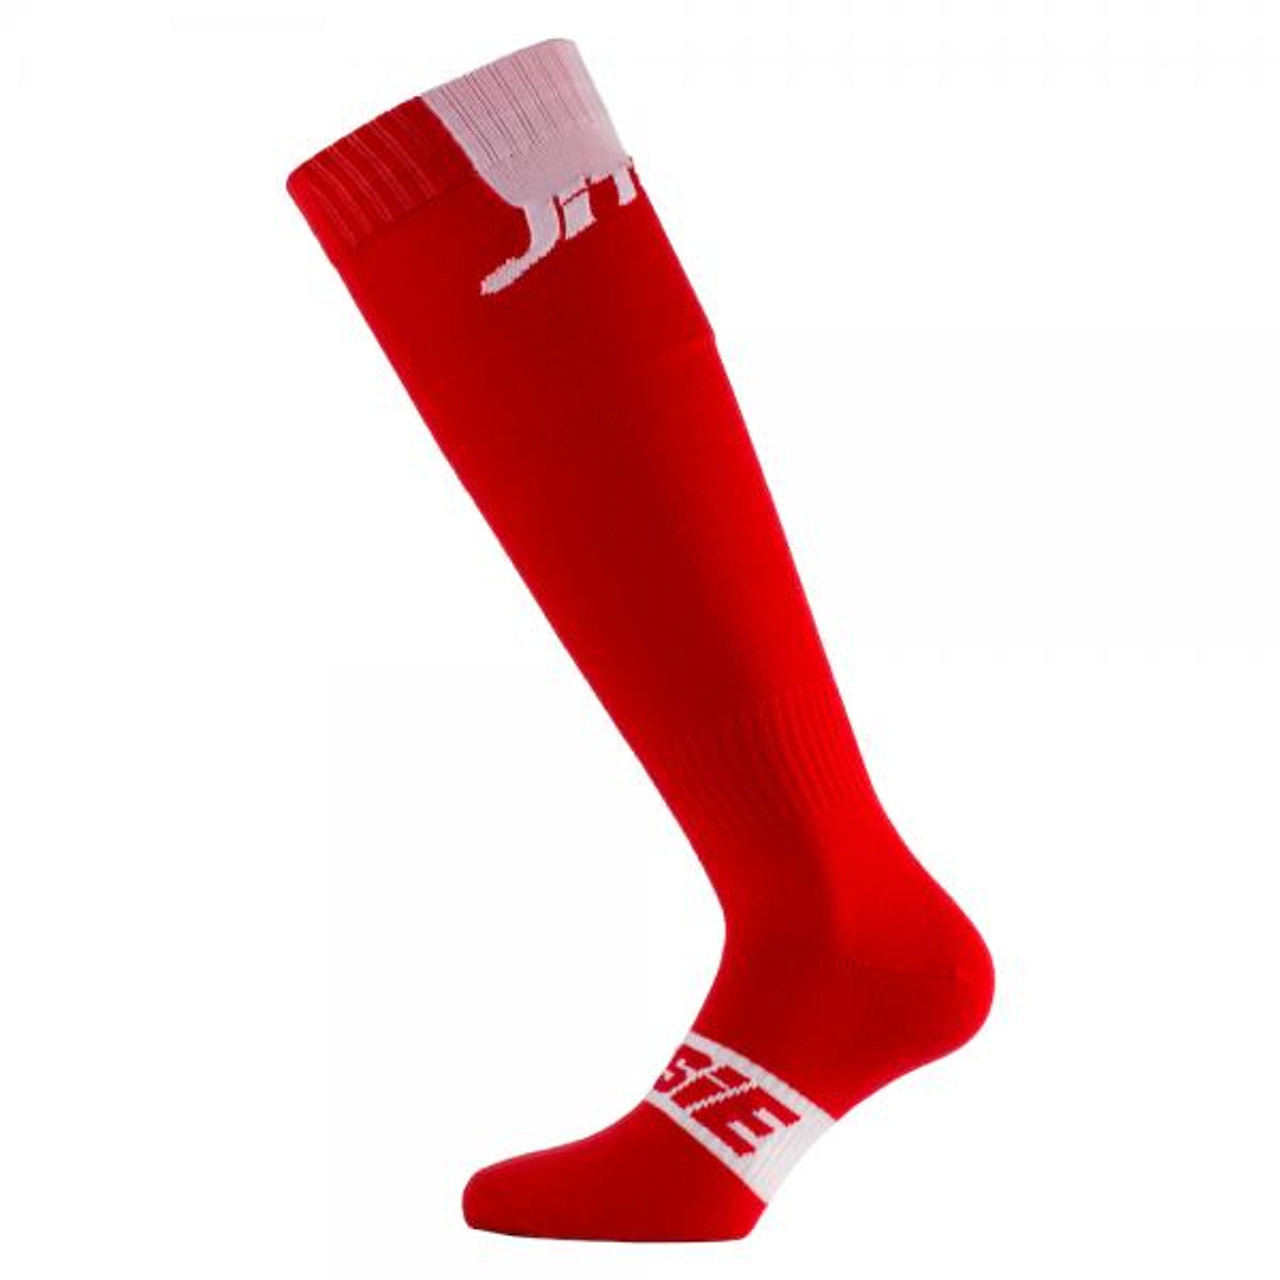 Jitsie long sock in red/ white